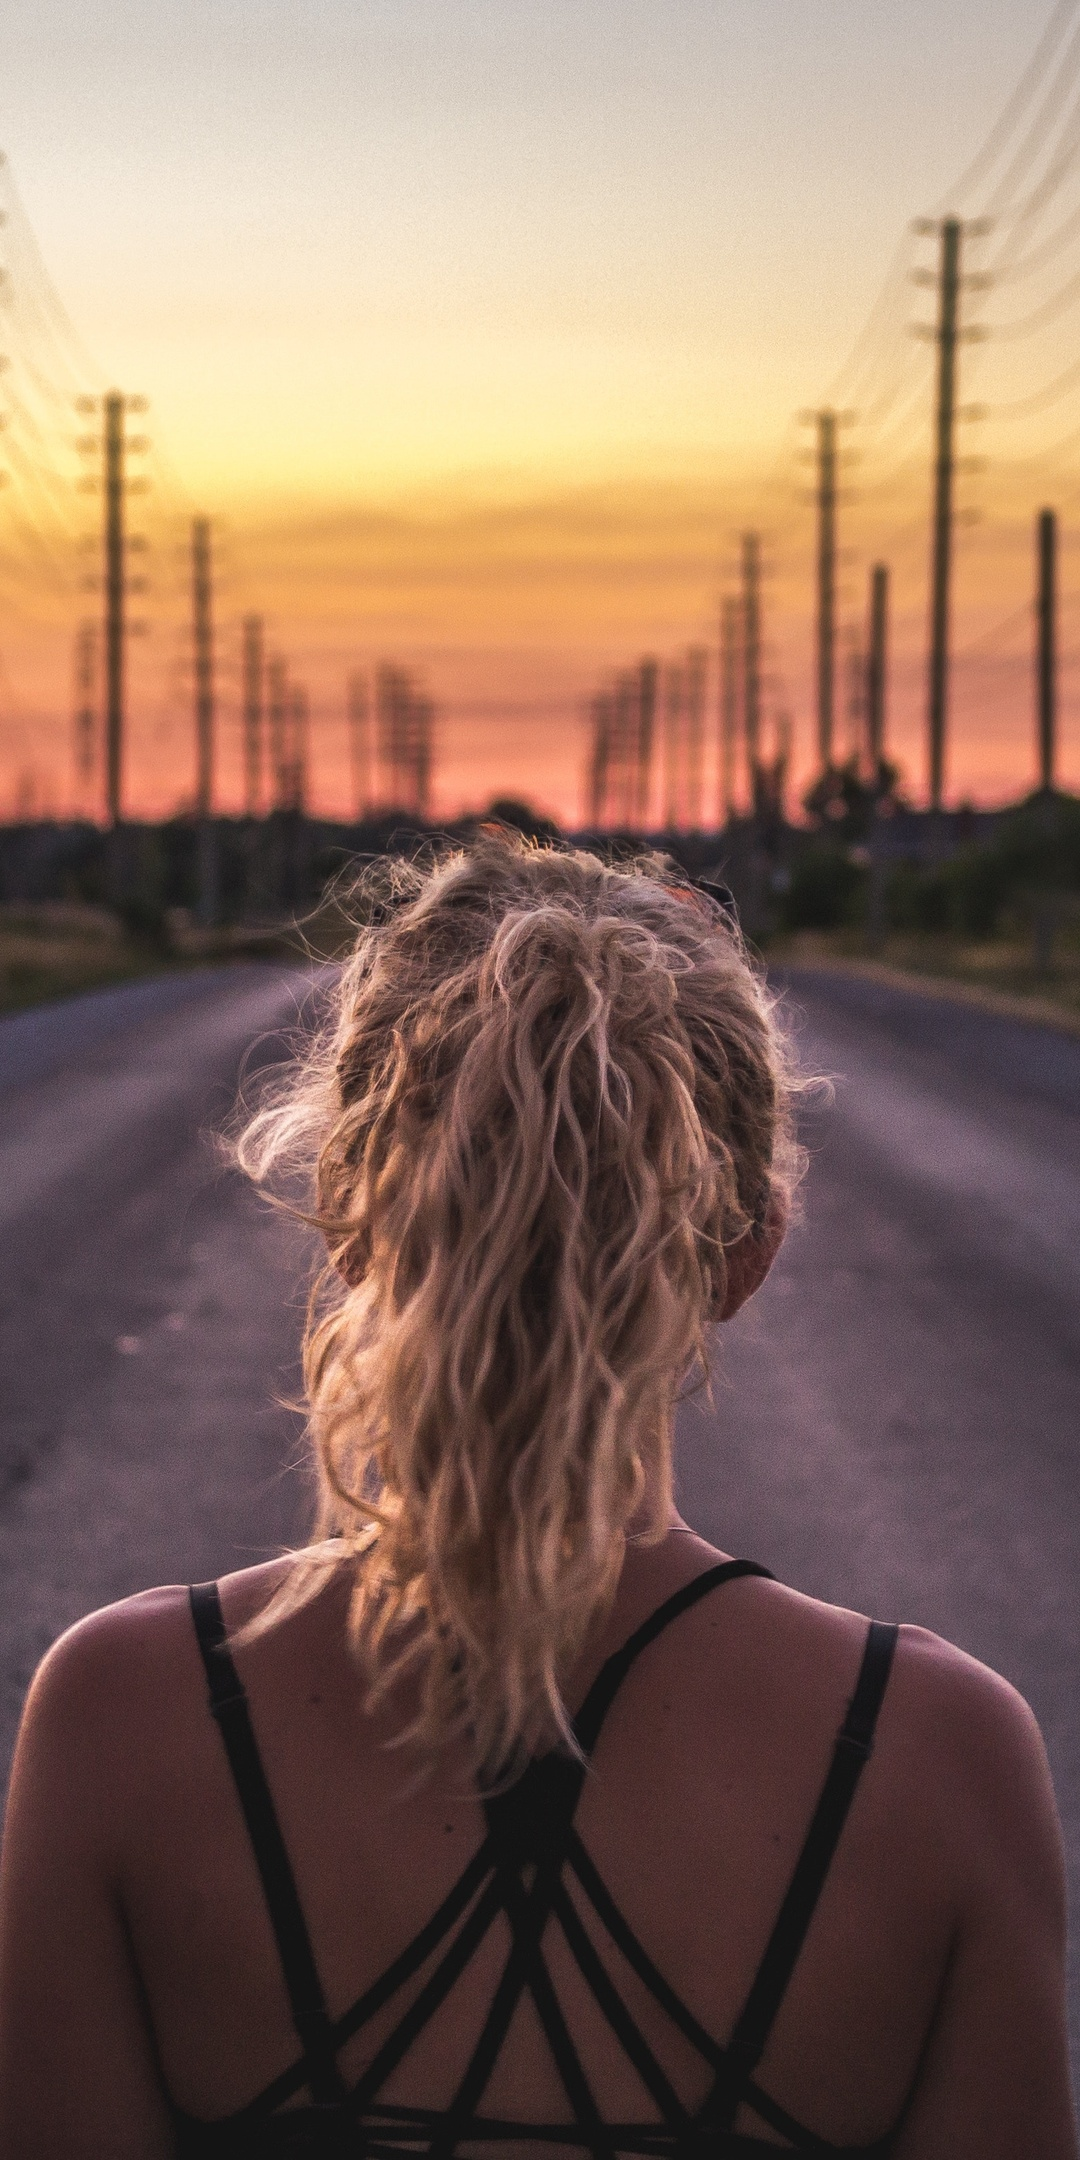 girl-running-jogging-working-out-sunrise-gt.jpg